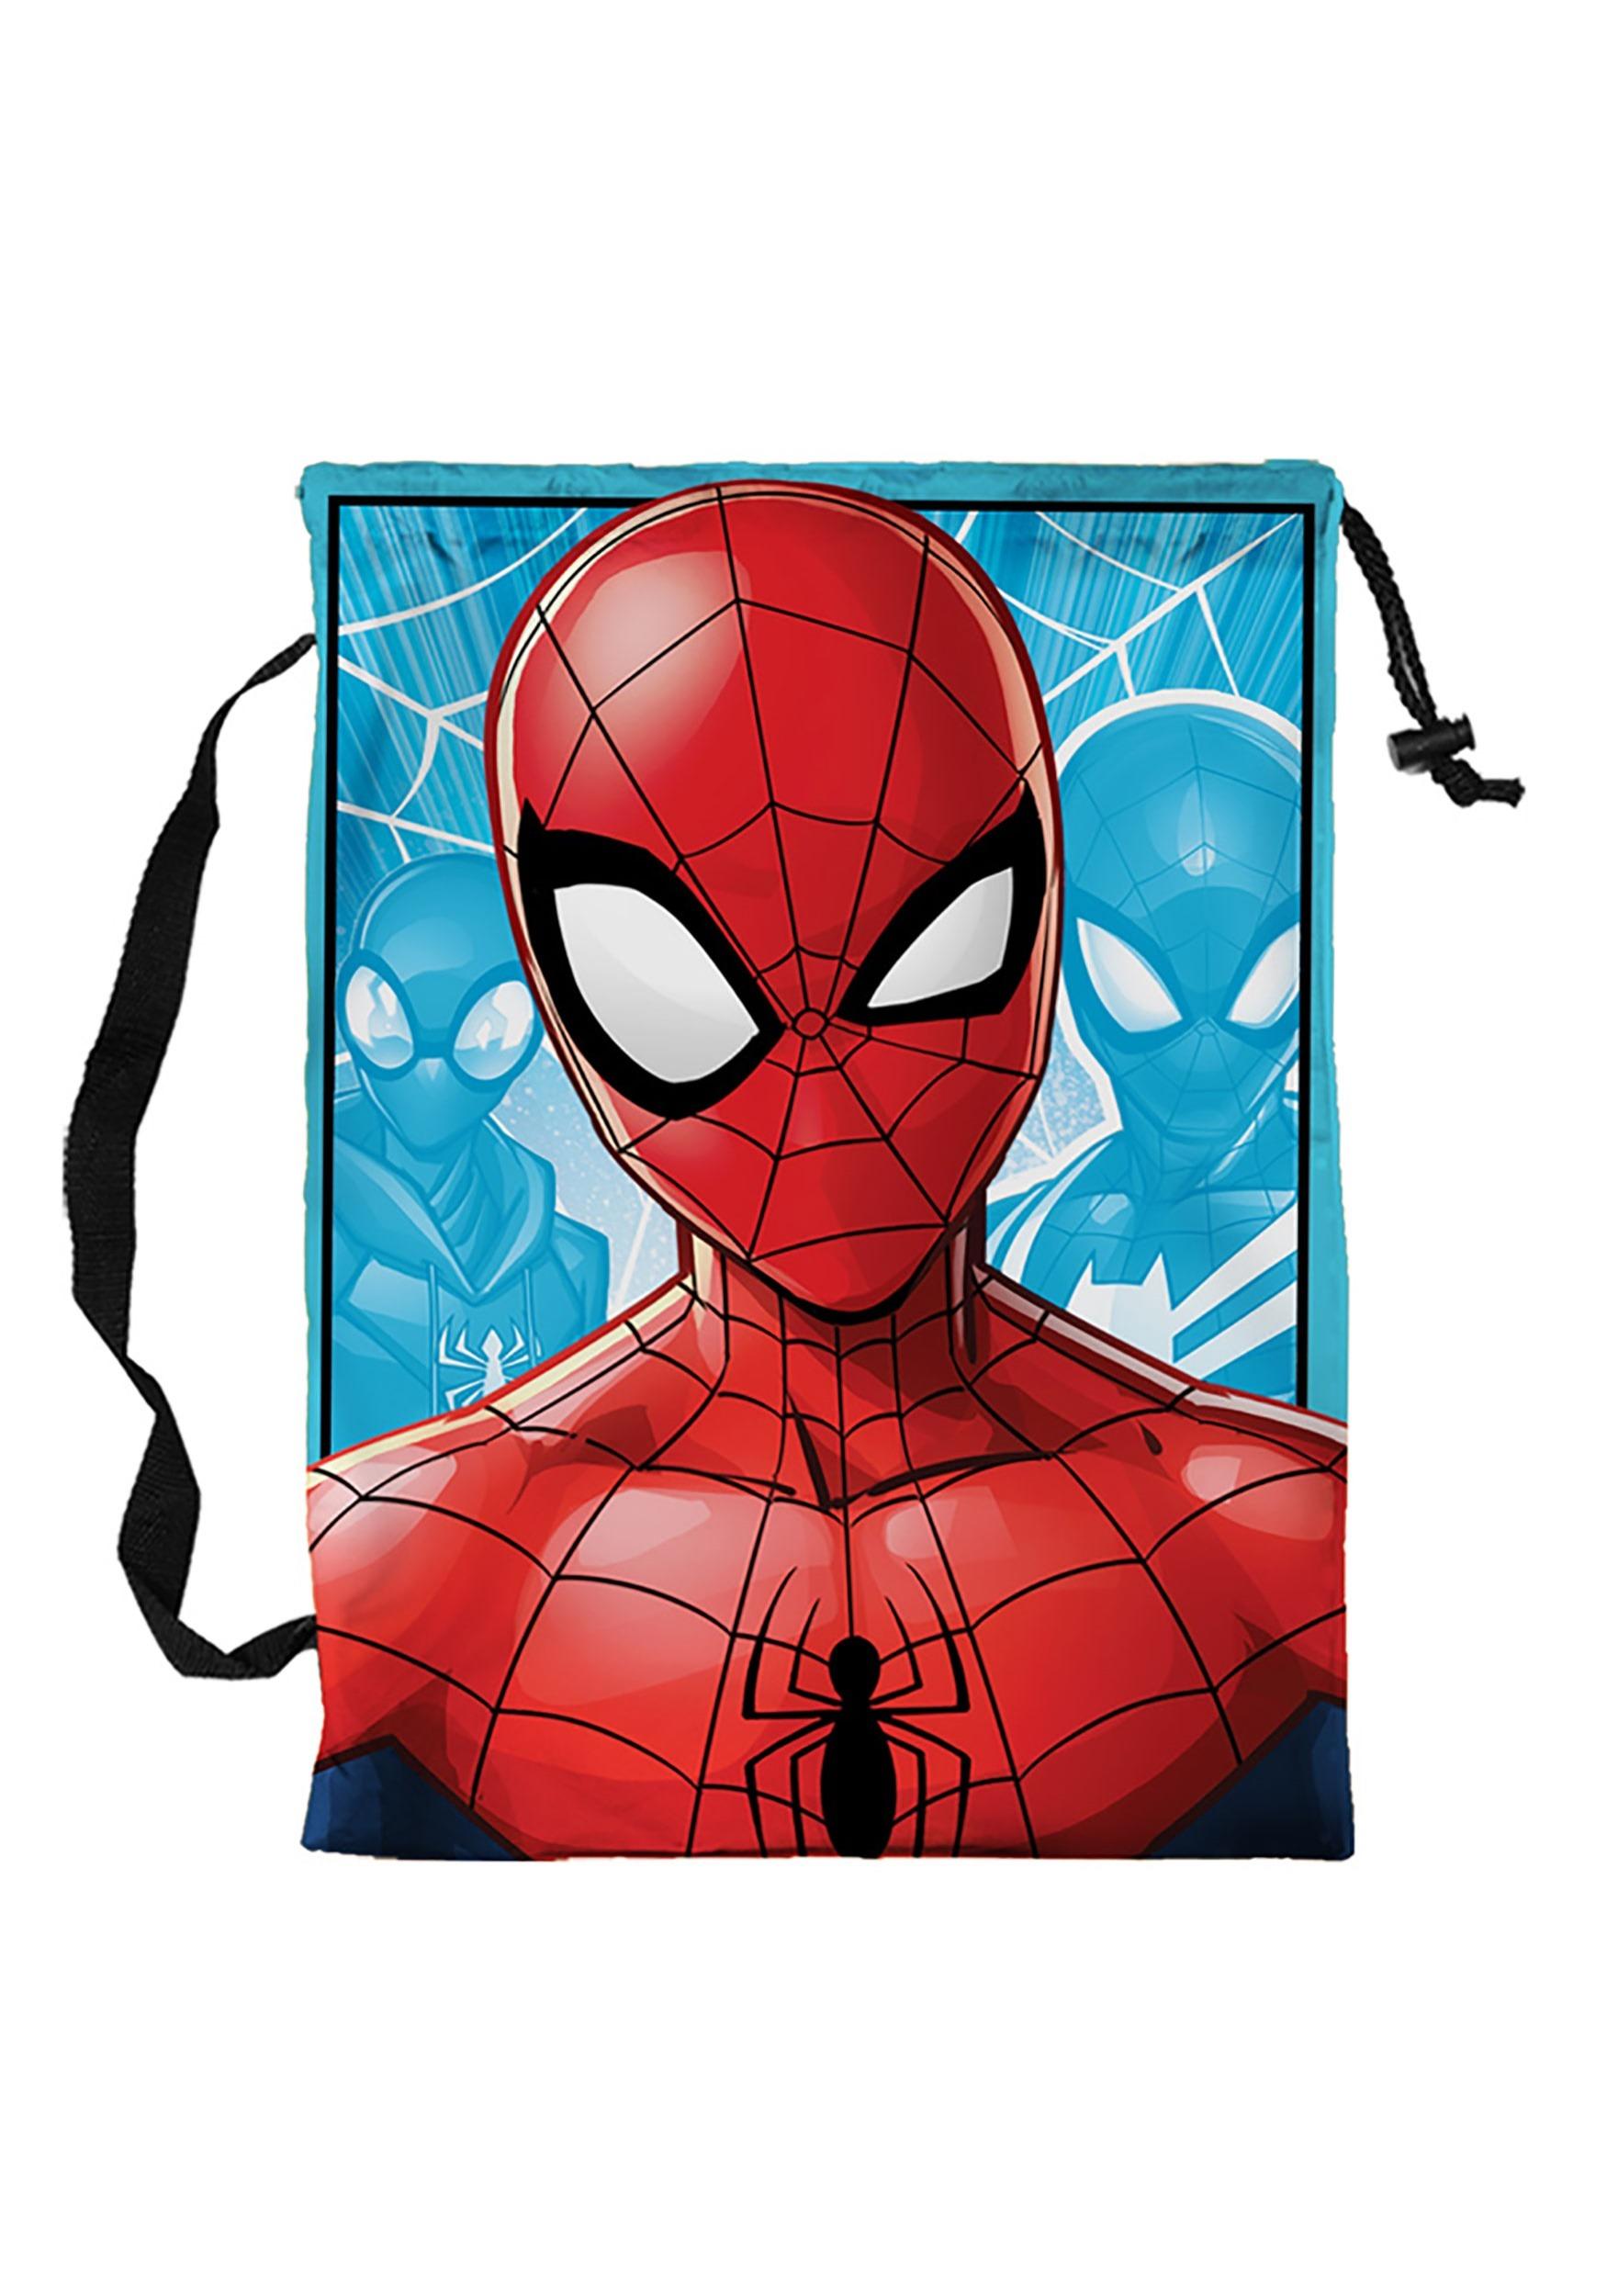 Spider-Man Pillow Case Treat Bag